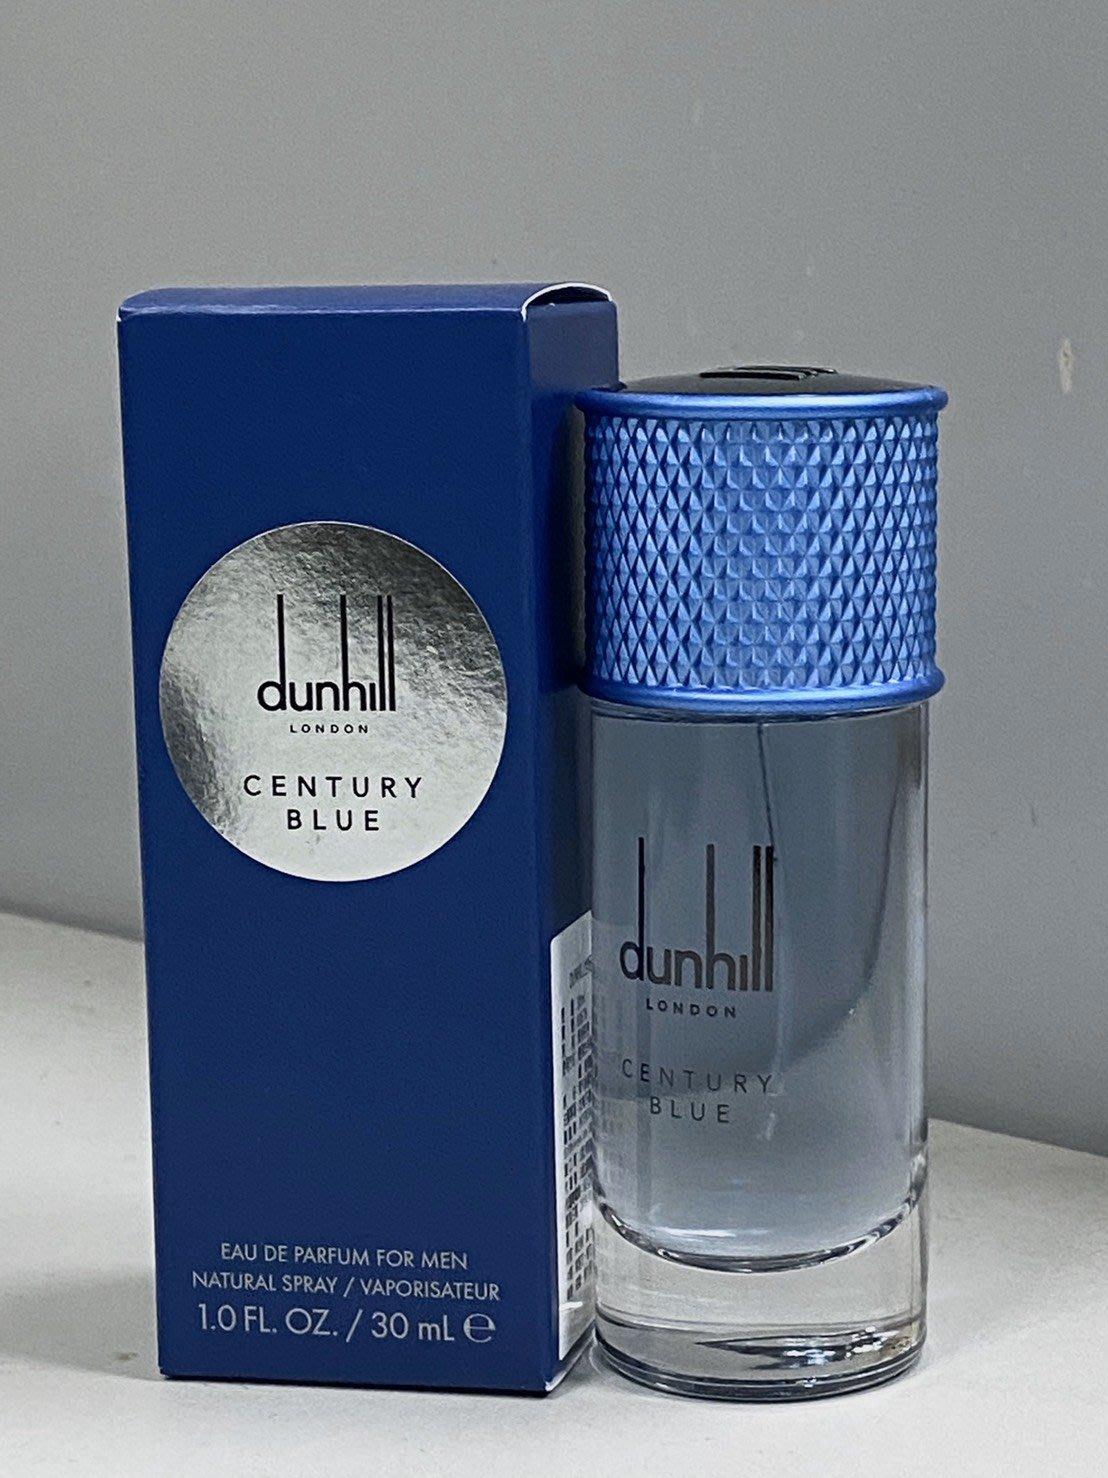 Dunhill世紀紳藍男性淡香精30ml(2024/10)